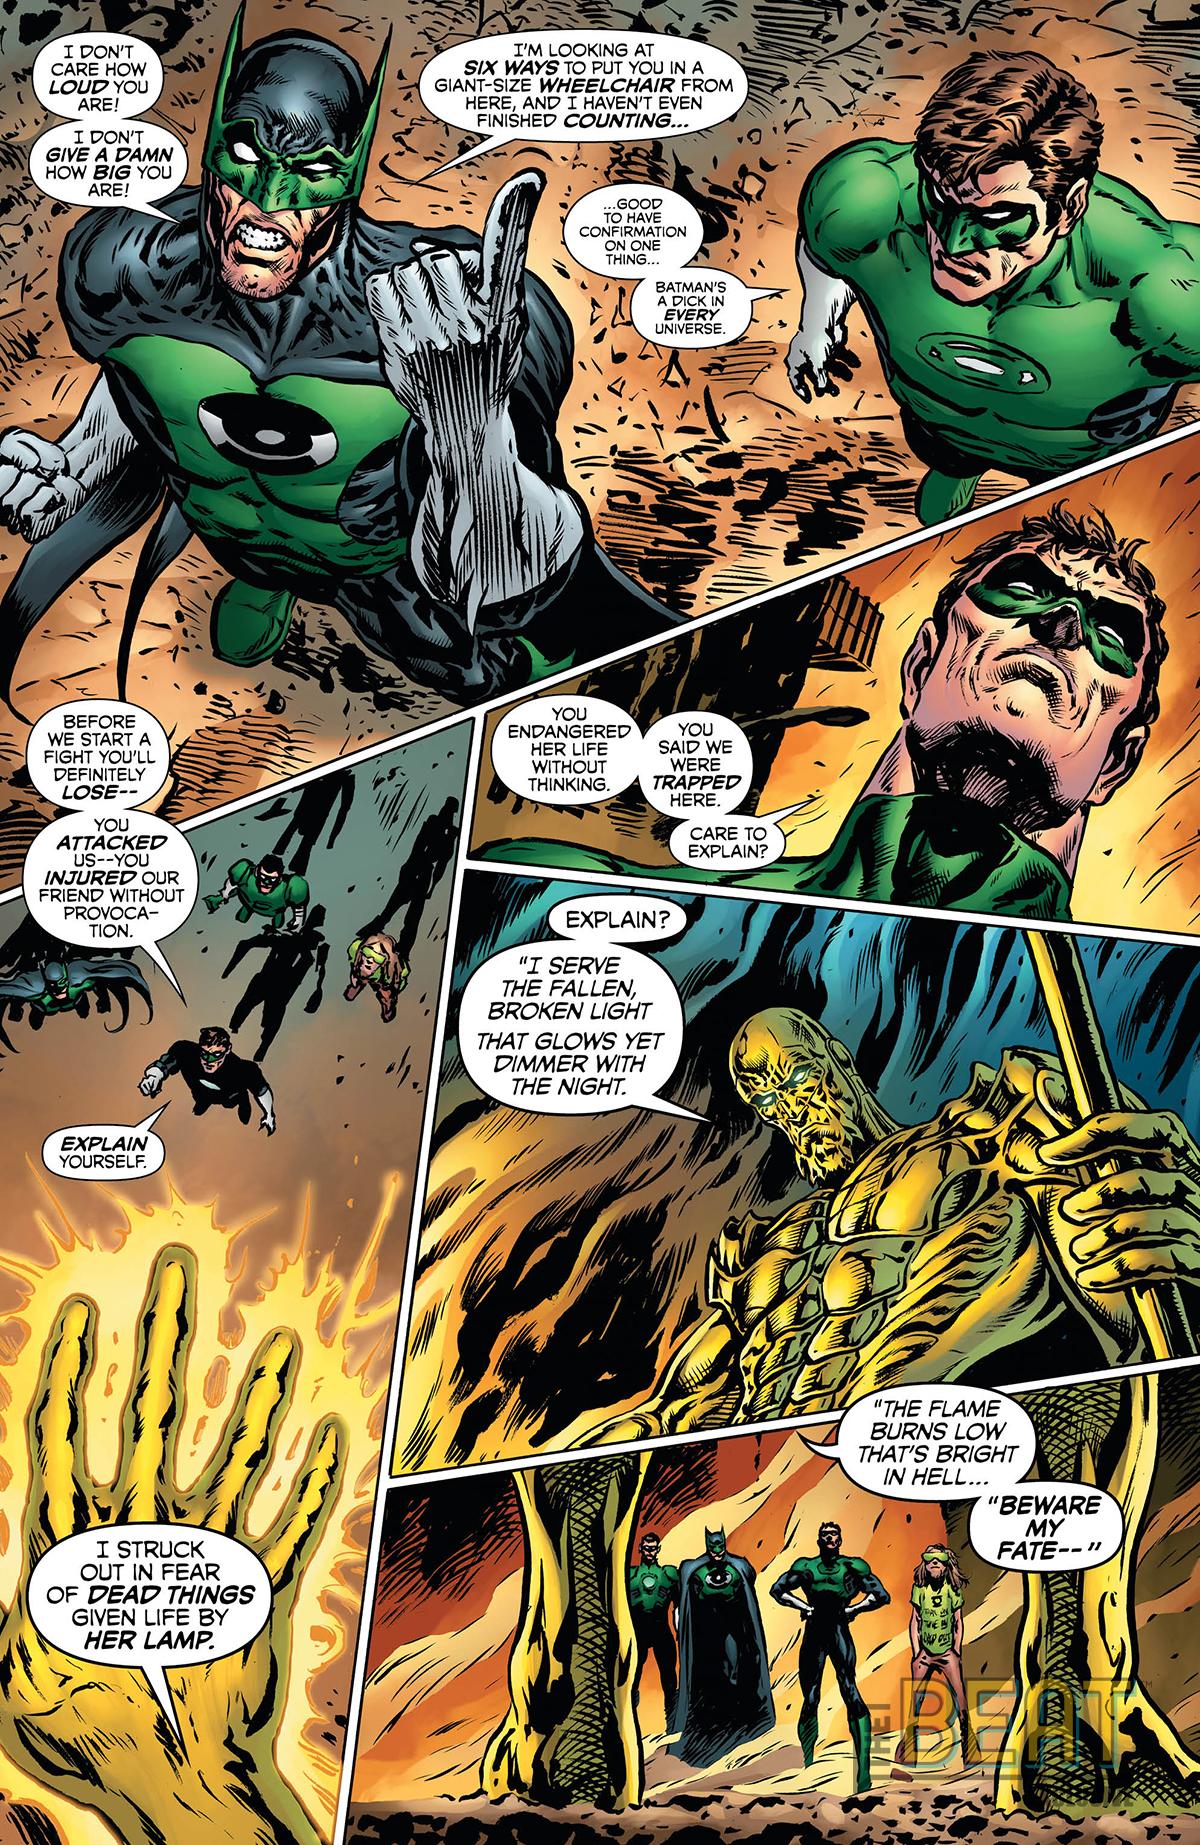 The Green Lantern #11 preview